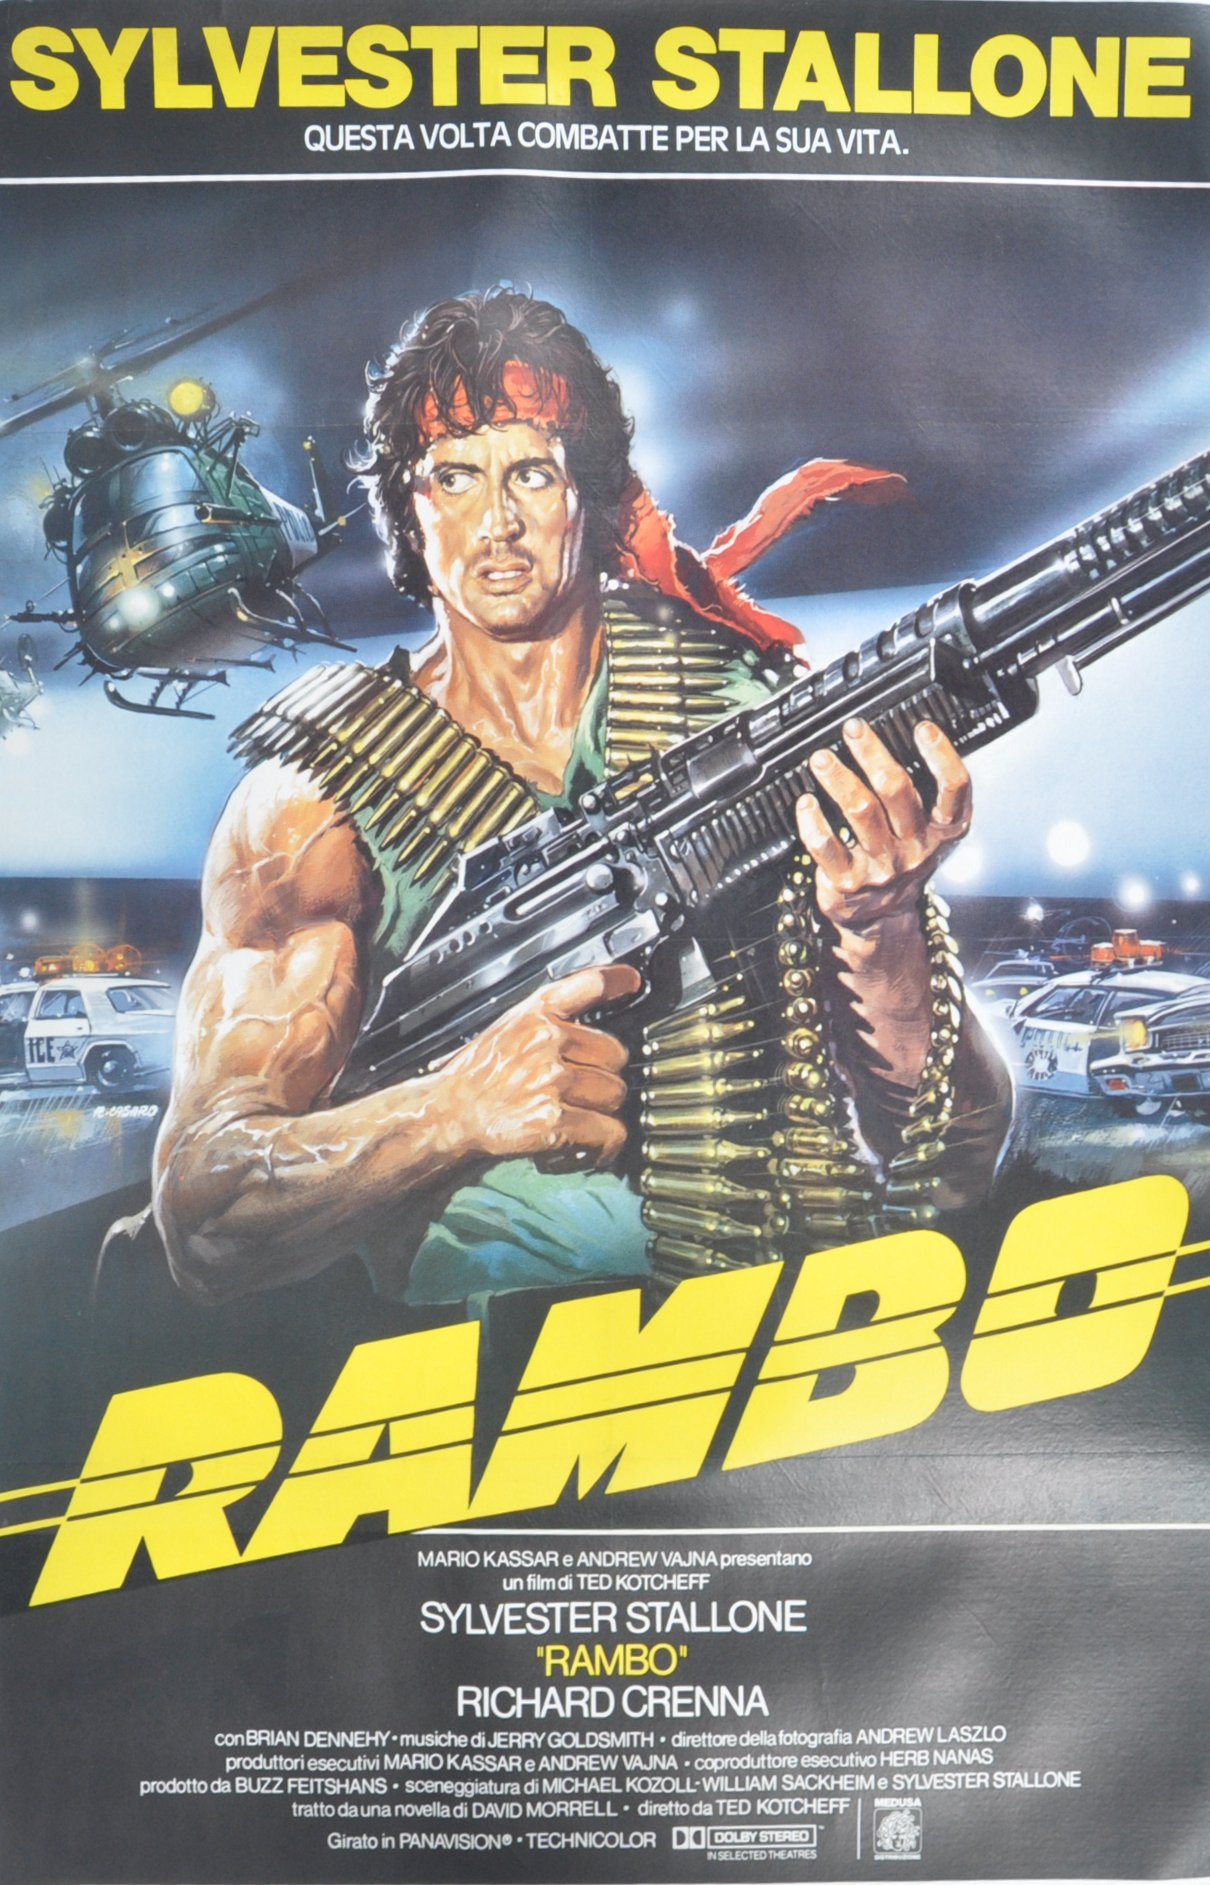 Lot 109 - ORIGINAL 1980'S RAMBO FIRST BLOOD ITALIAN MOVIE PO